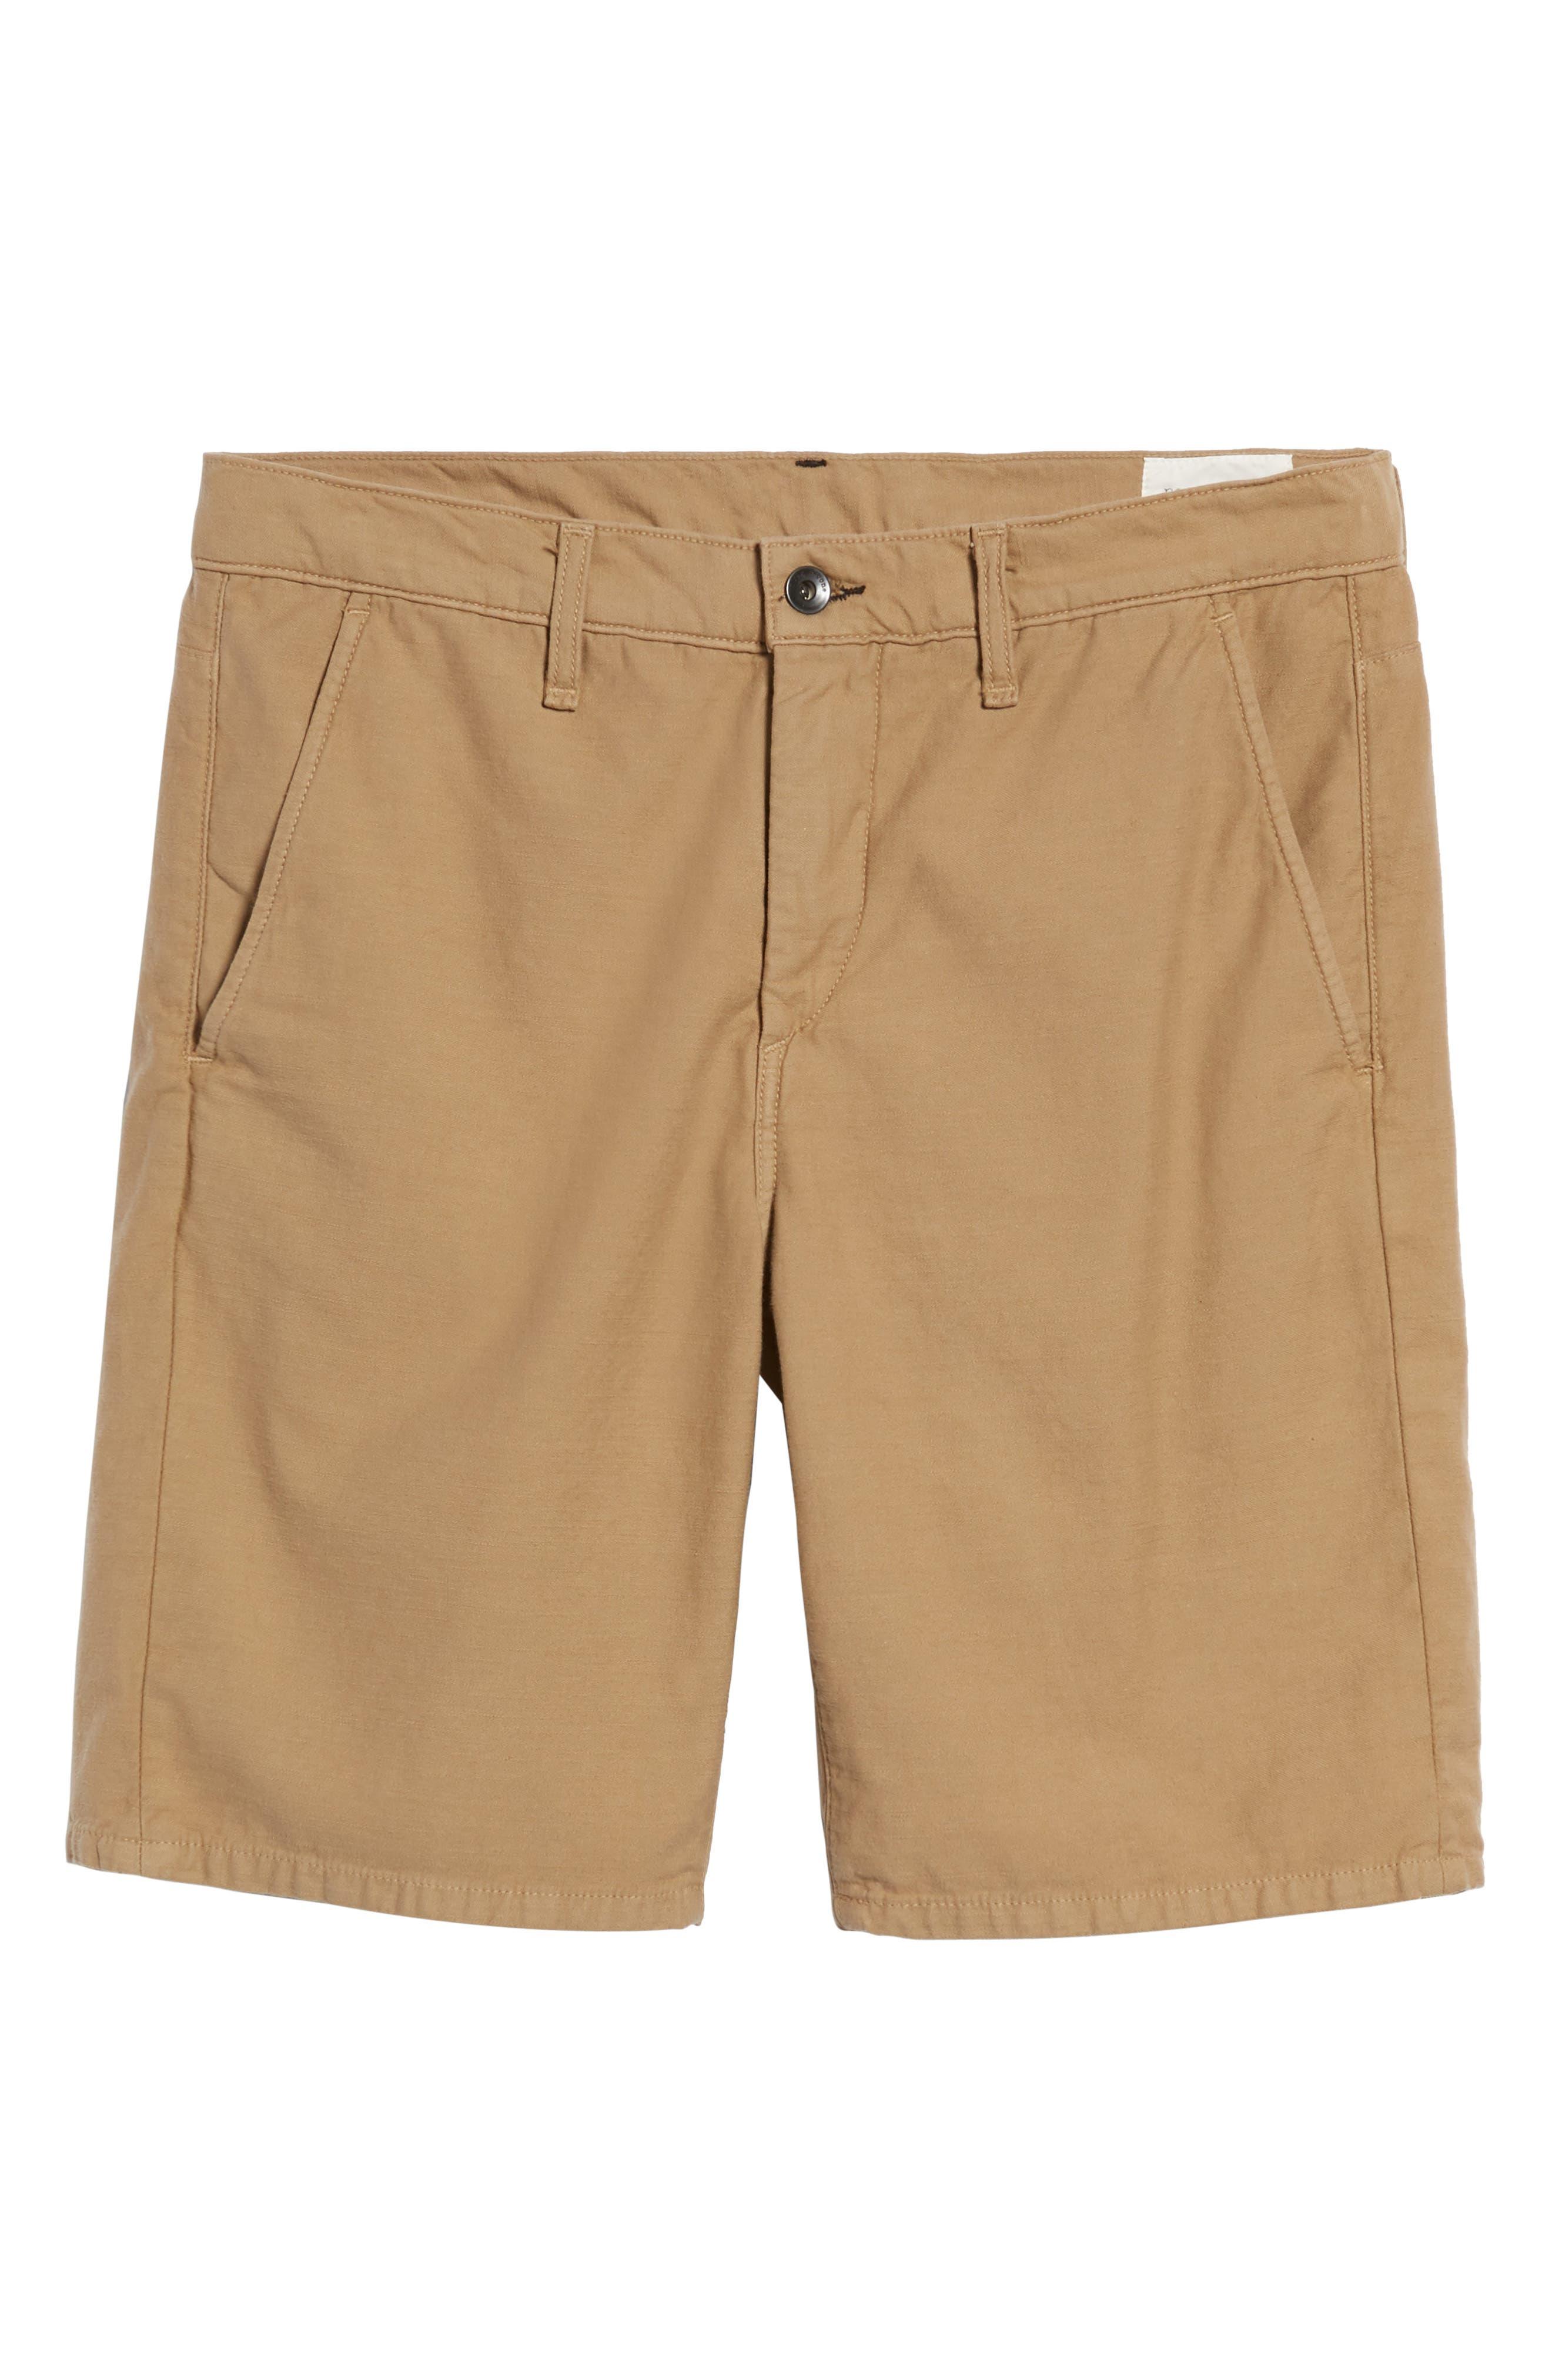 Straight Leg Chino Shorts,                             Alternate thumbnail 6, color,                             KHAKI